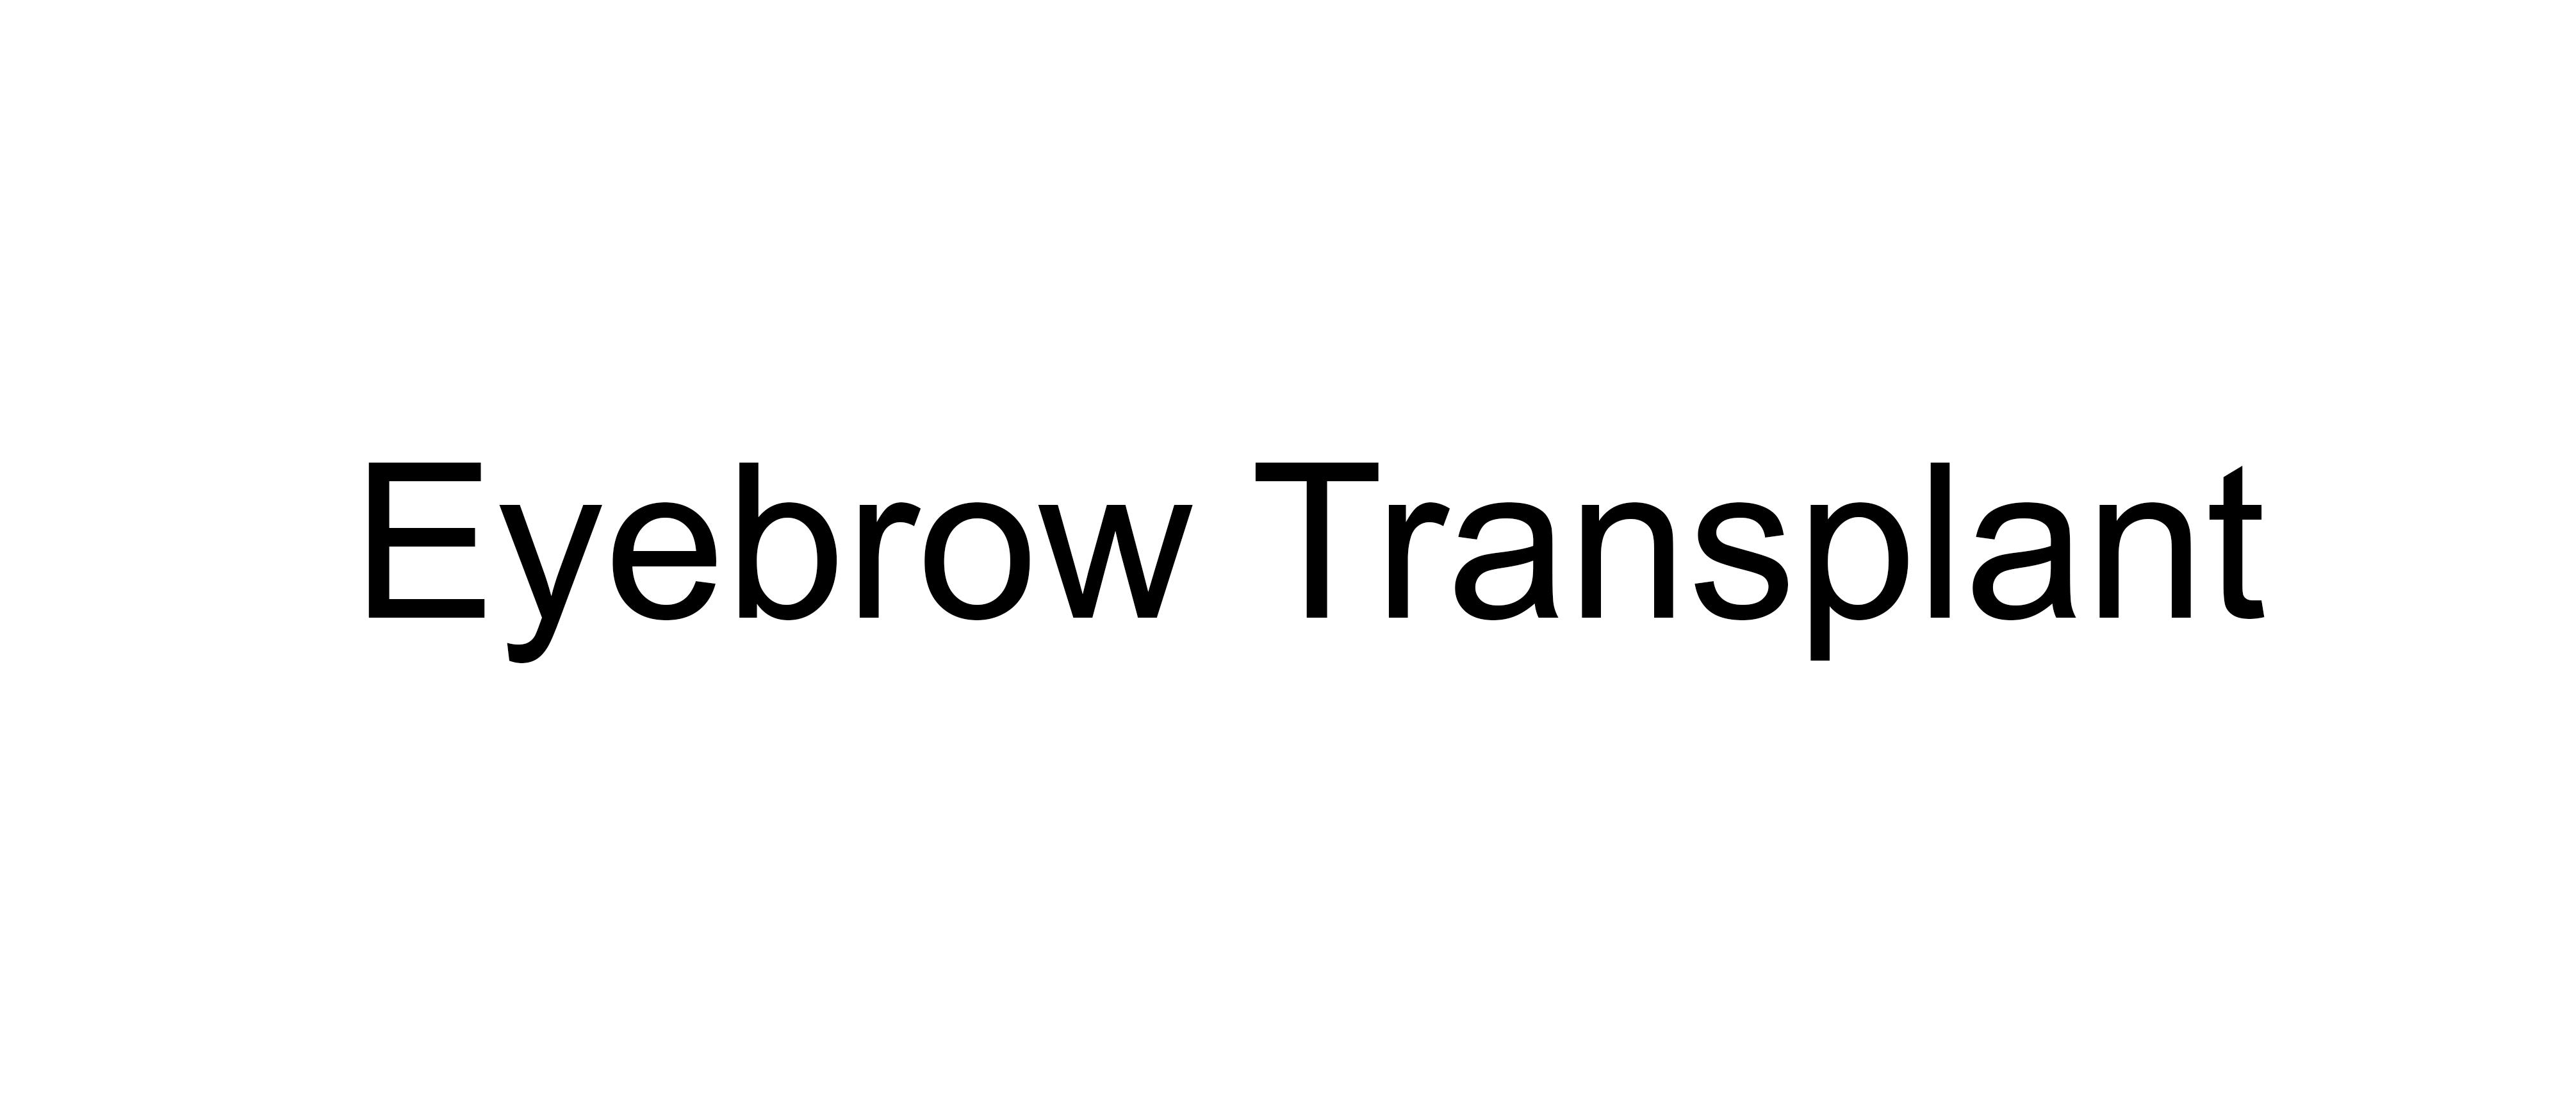 Eyebrow Transplant